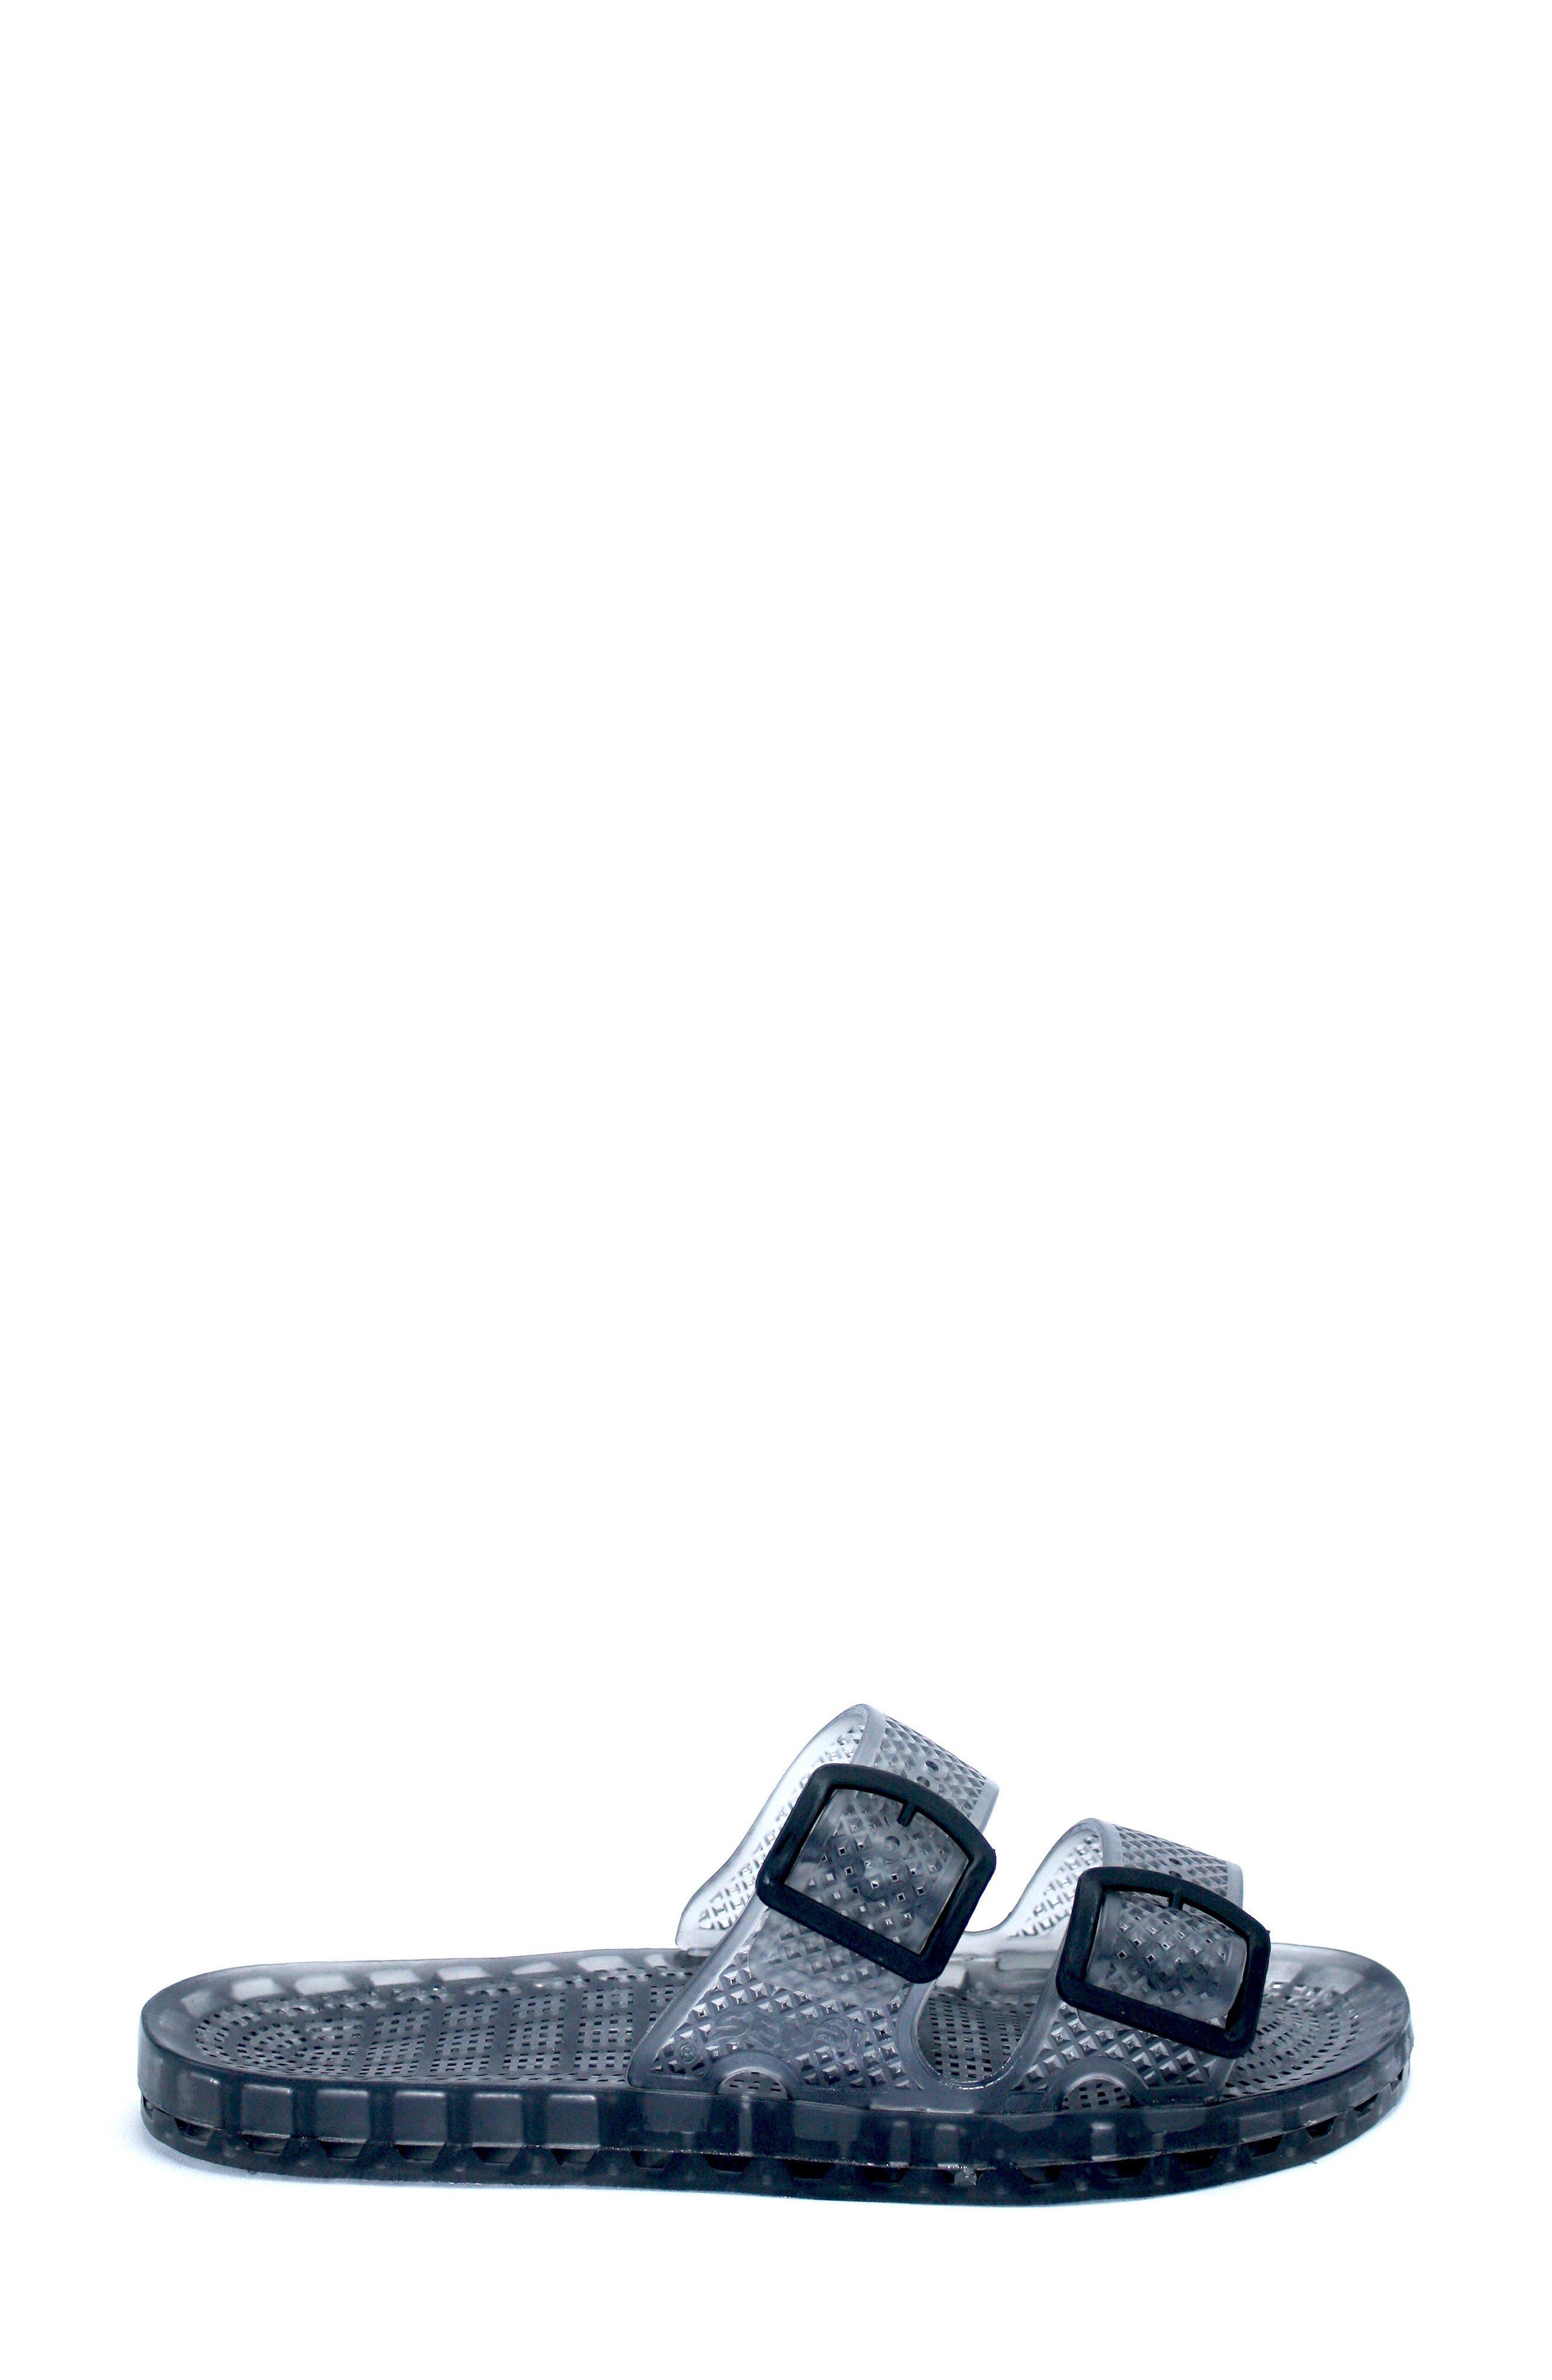 La Jolla Slide Sandal,                             Alternate thumbnail 3, color,                             Smoke Rubber